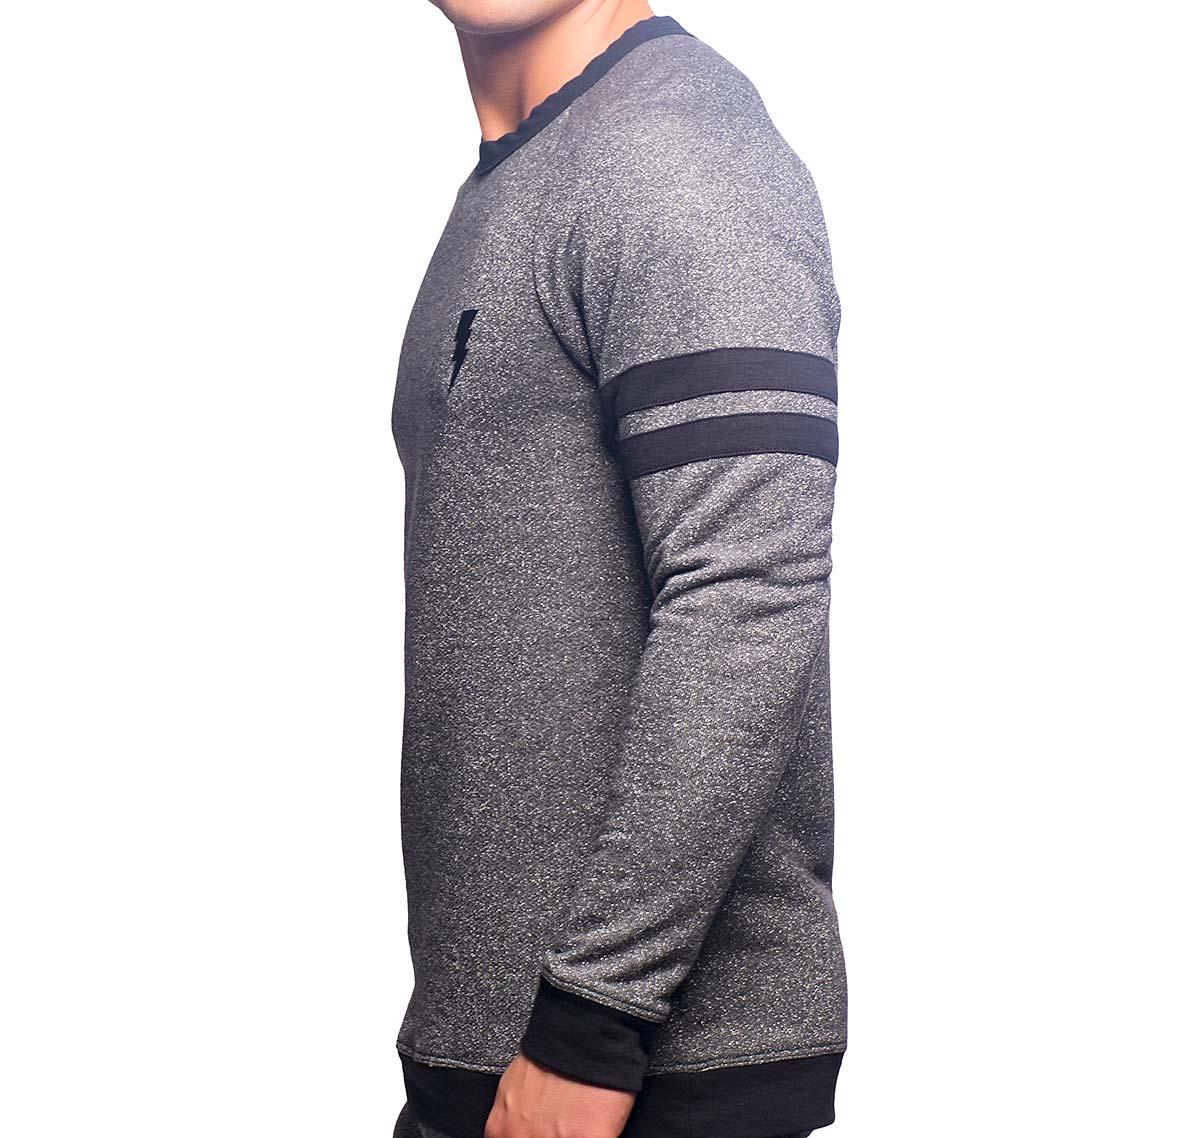 Andrew Christian maillot de sport LIGHTNING SPARKLE SWEATSHIRT 10239, gris